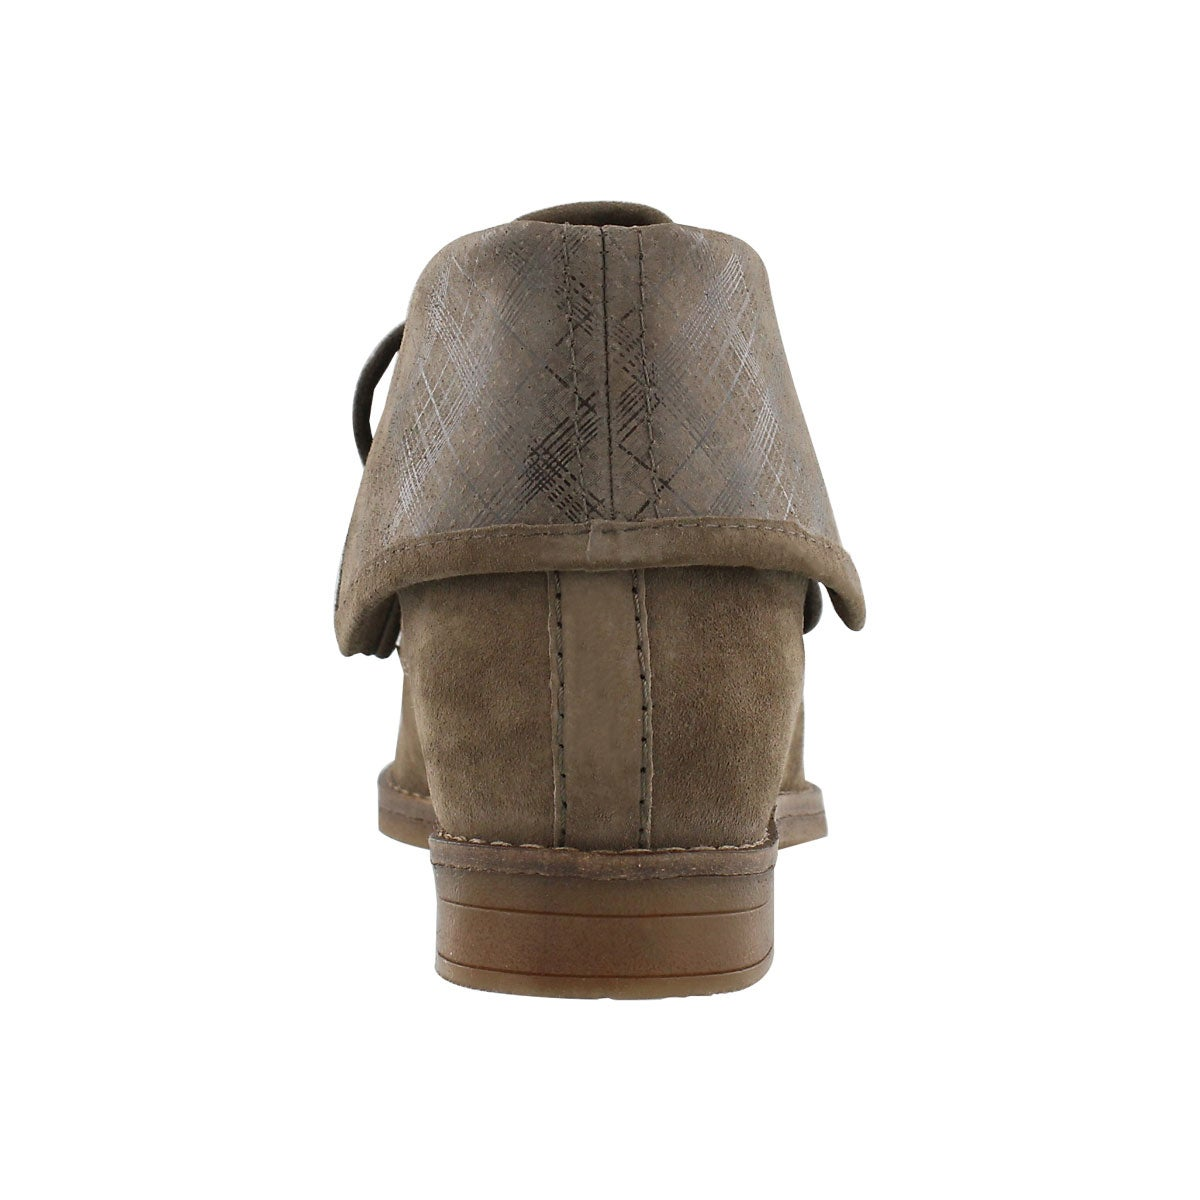 Lds Milos Cayto gun foldover cuff bootie